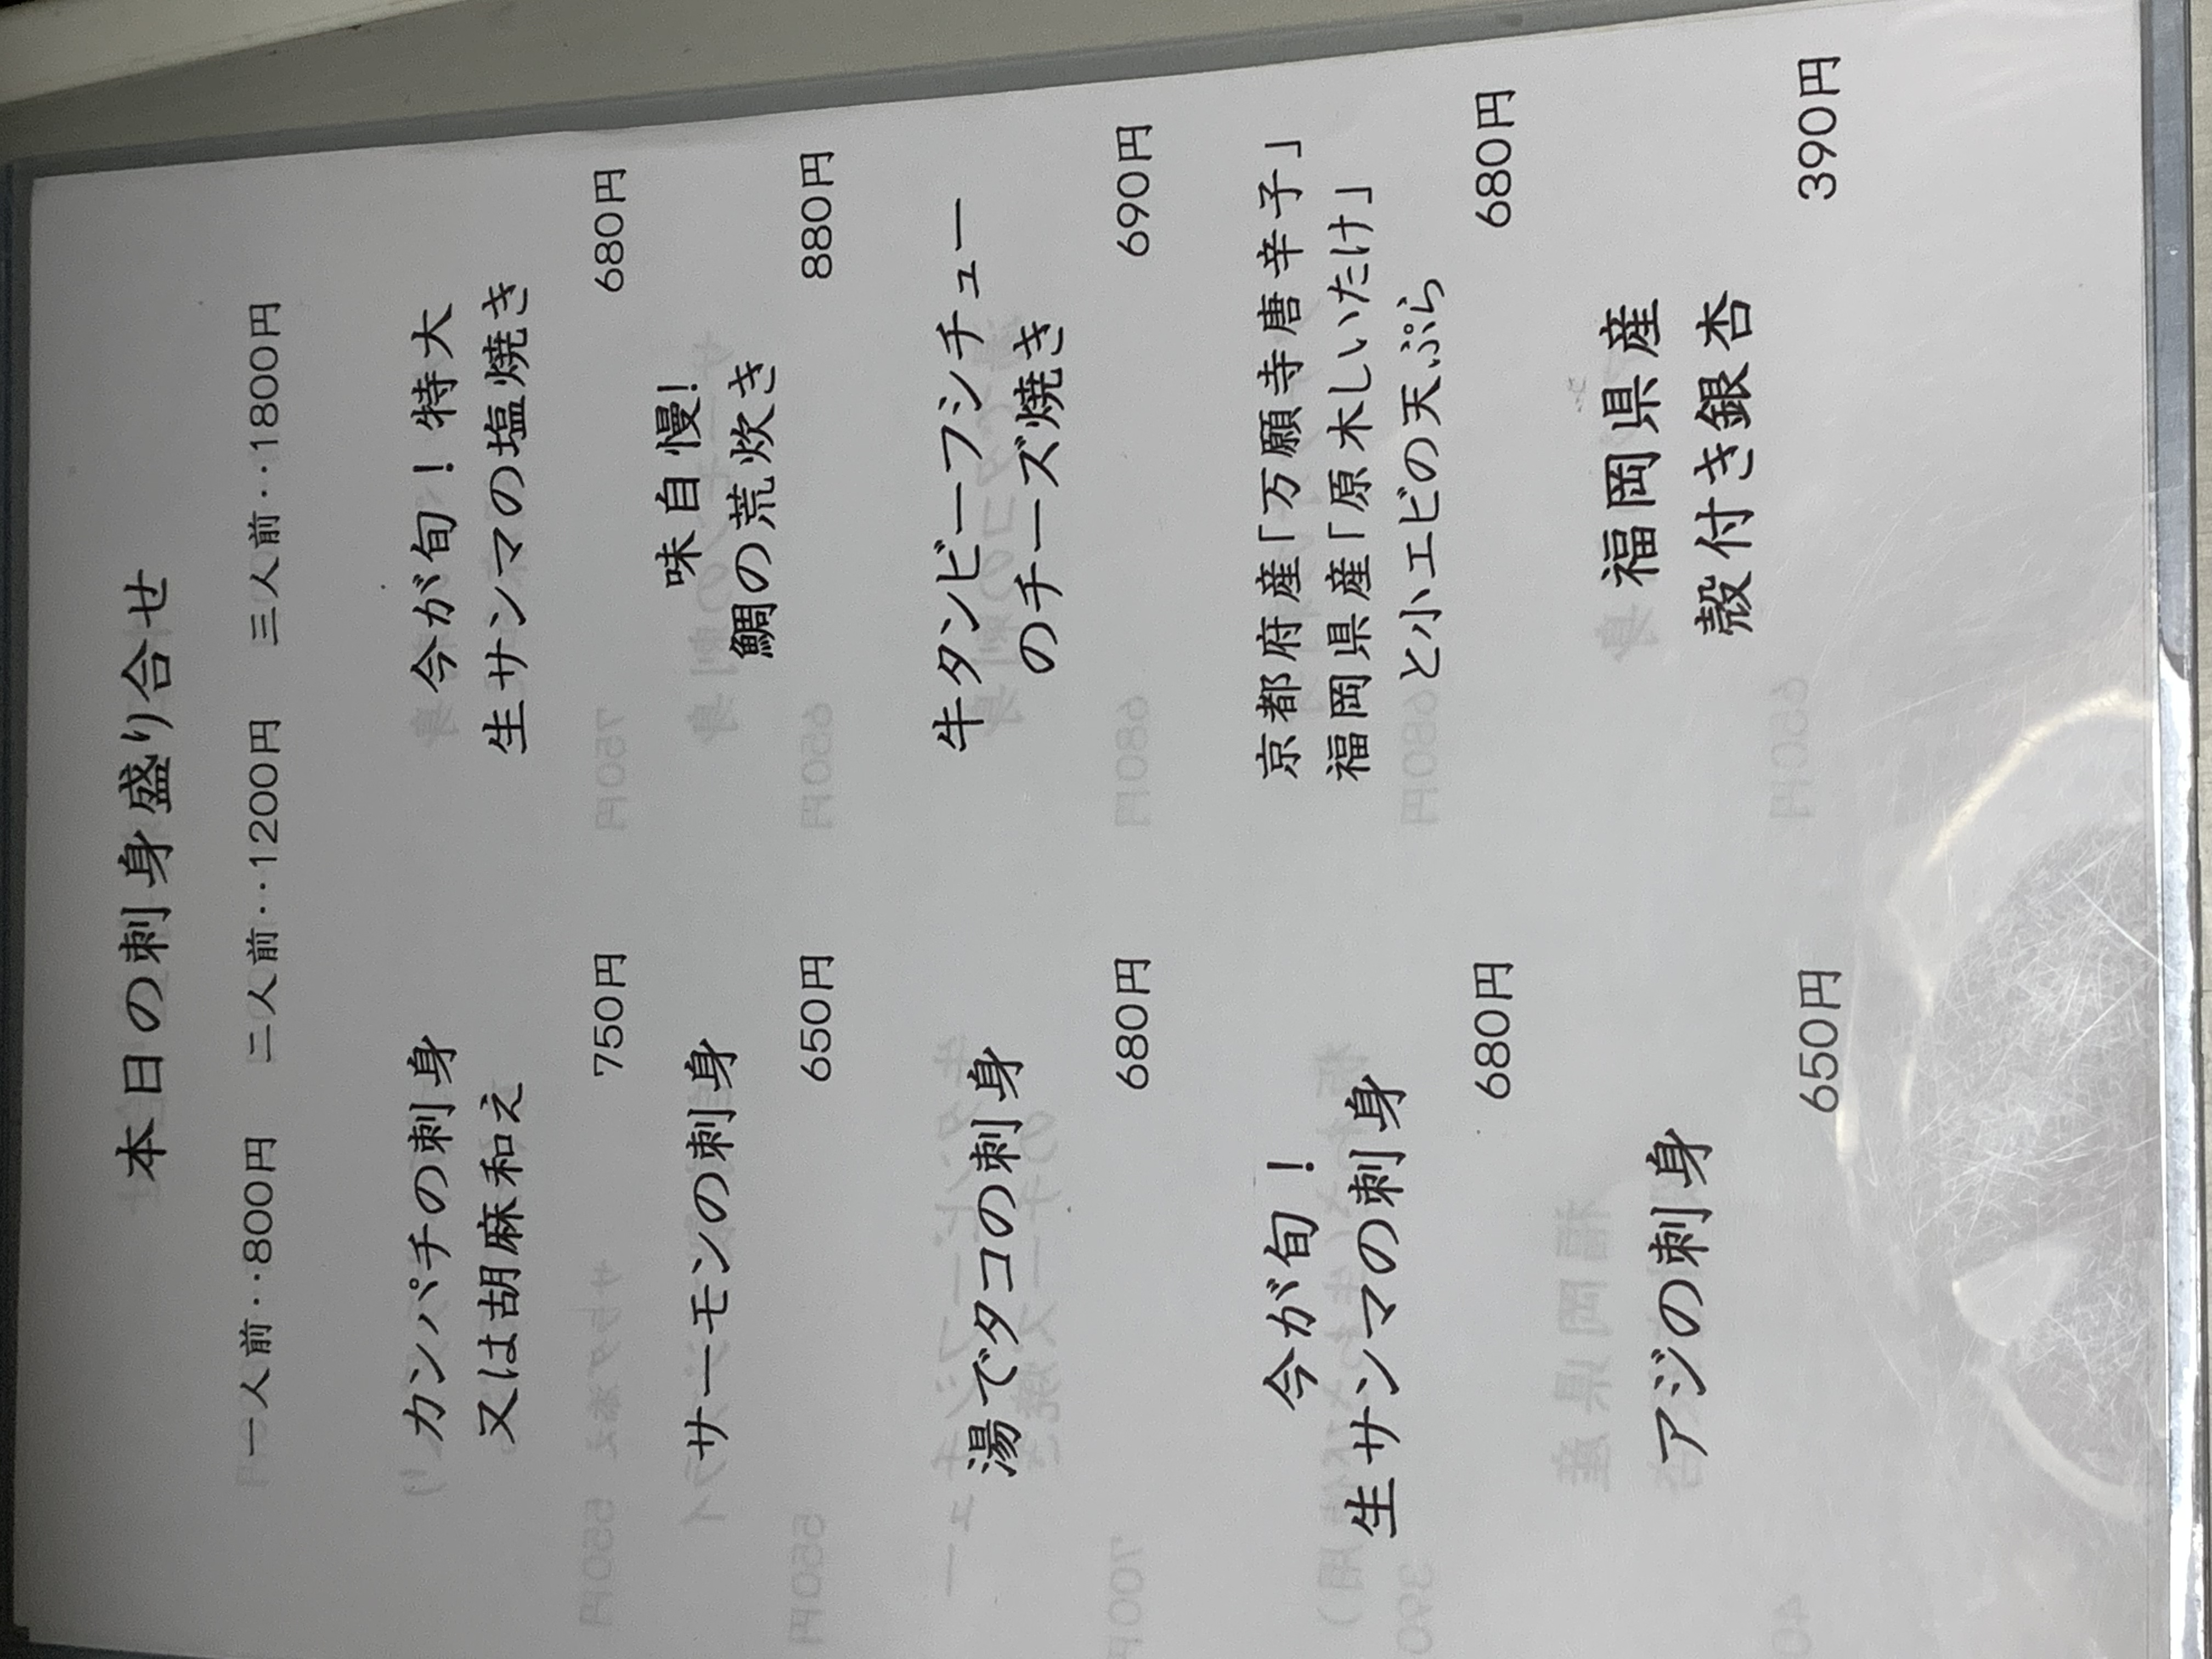 EAC85F38-A4C4-4952-96CF-05F63E54818B